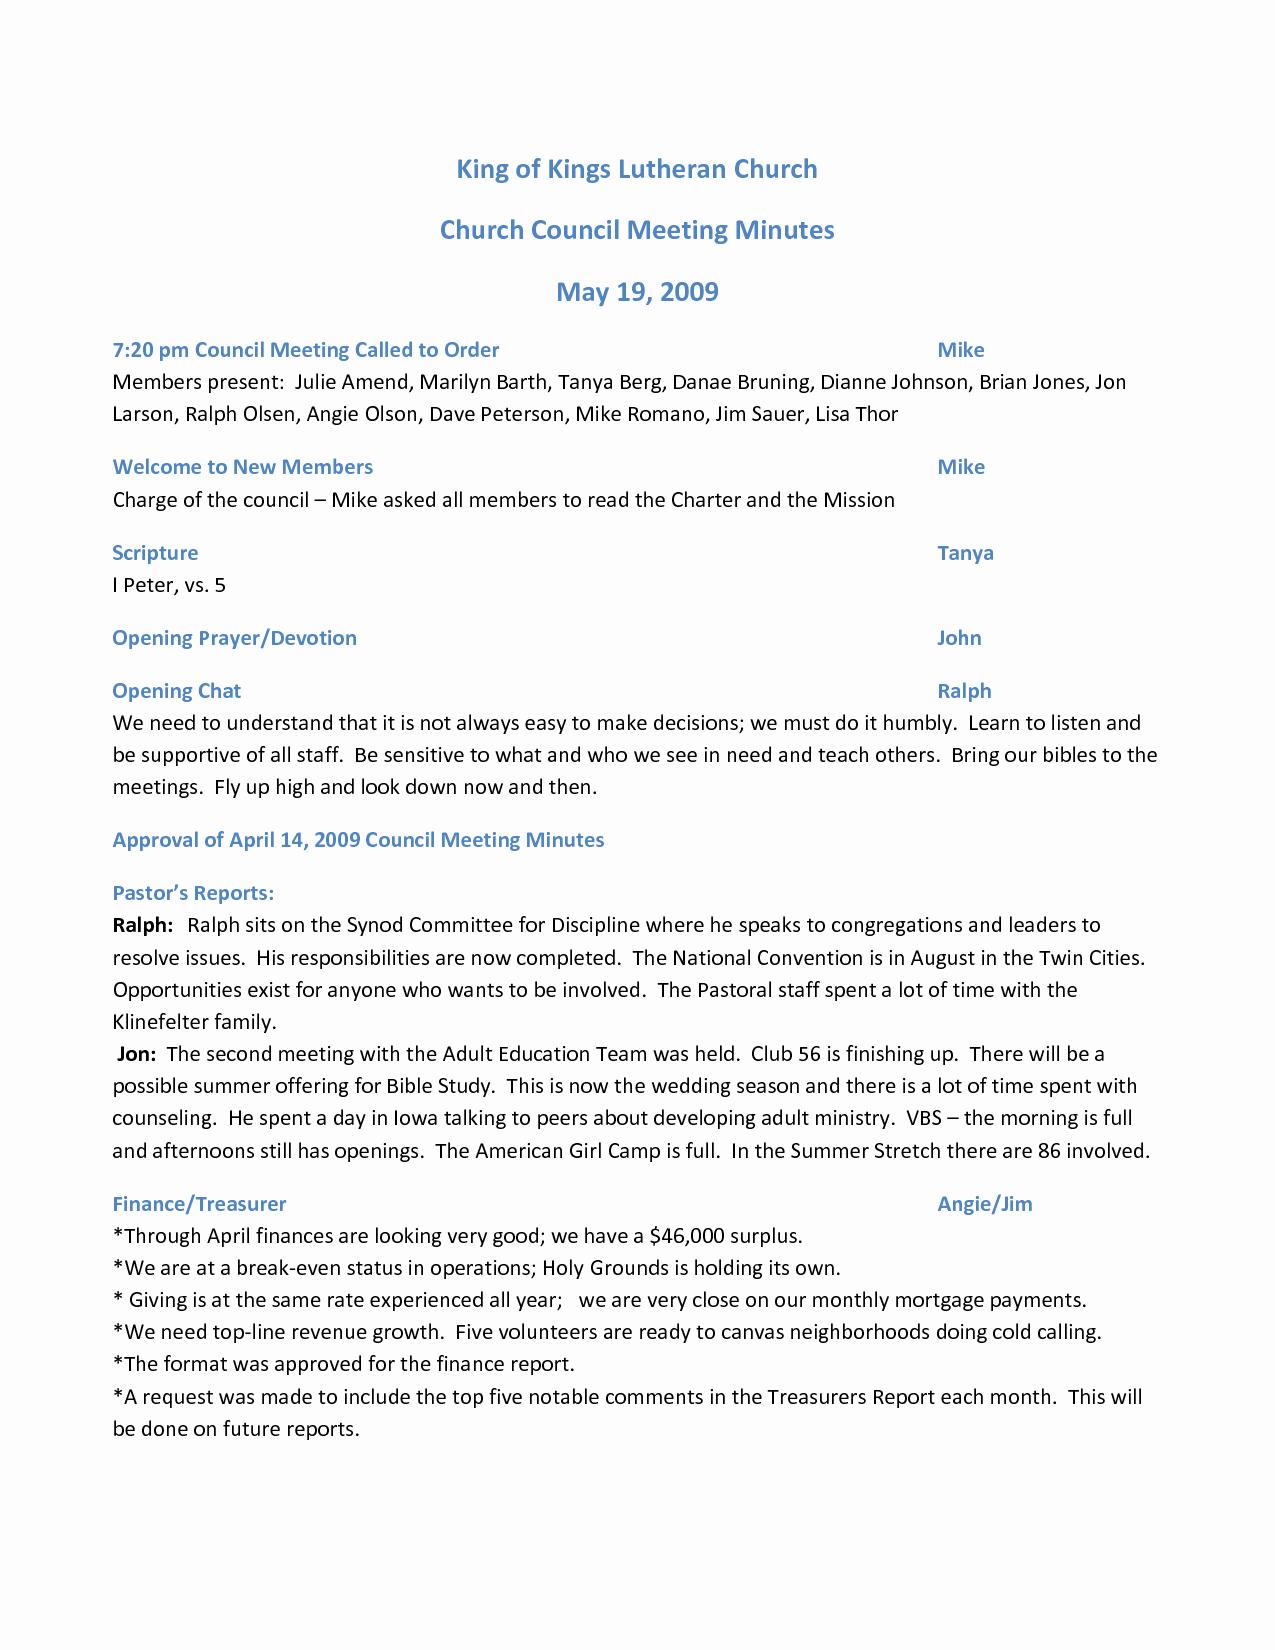 Church Business Meeting Minutes Template Beautiful Best S Of Pentacostal Church Meeting Minutes Template Sample Church Meeting Minutes